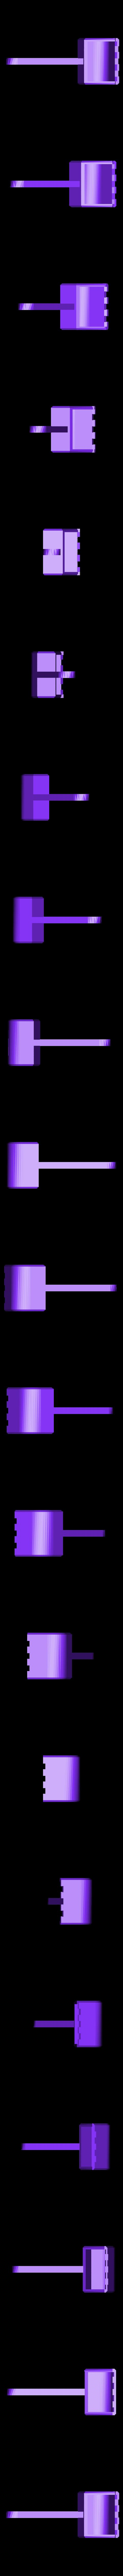 Bucket.stl Download free STL file Fingerdigger • Design to 3D print, Zippityboomba